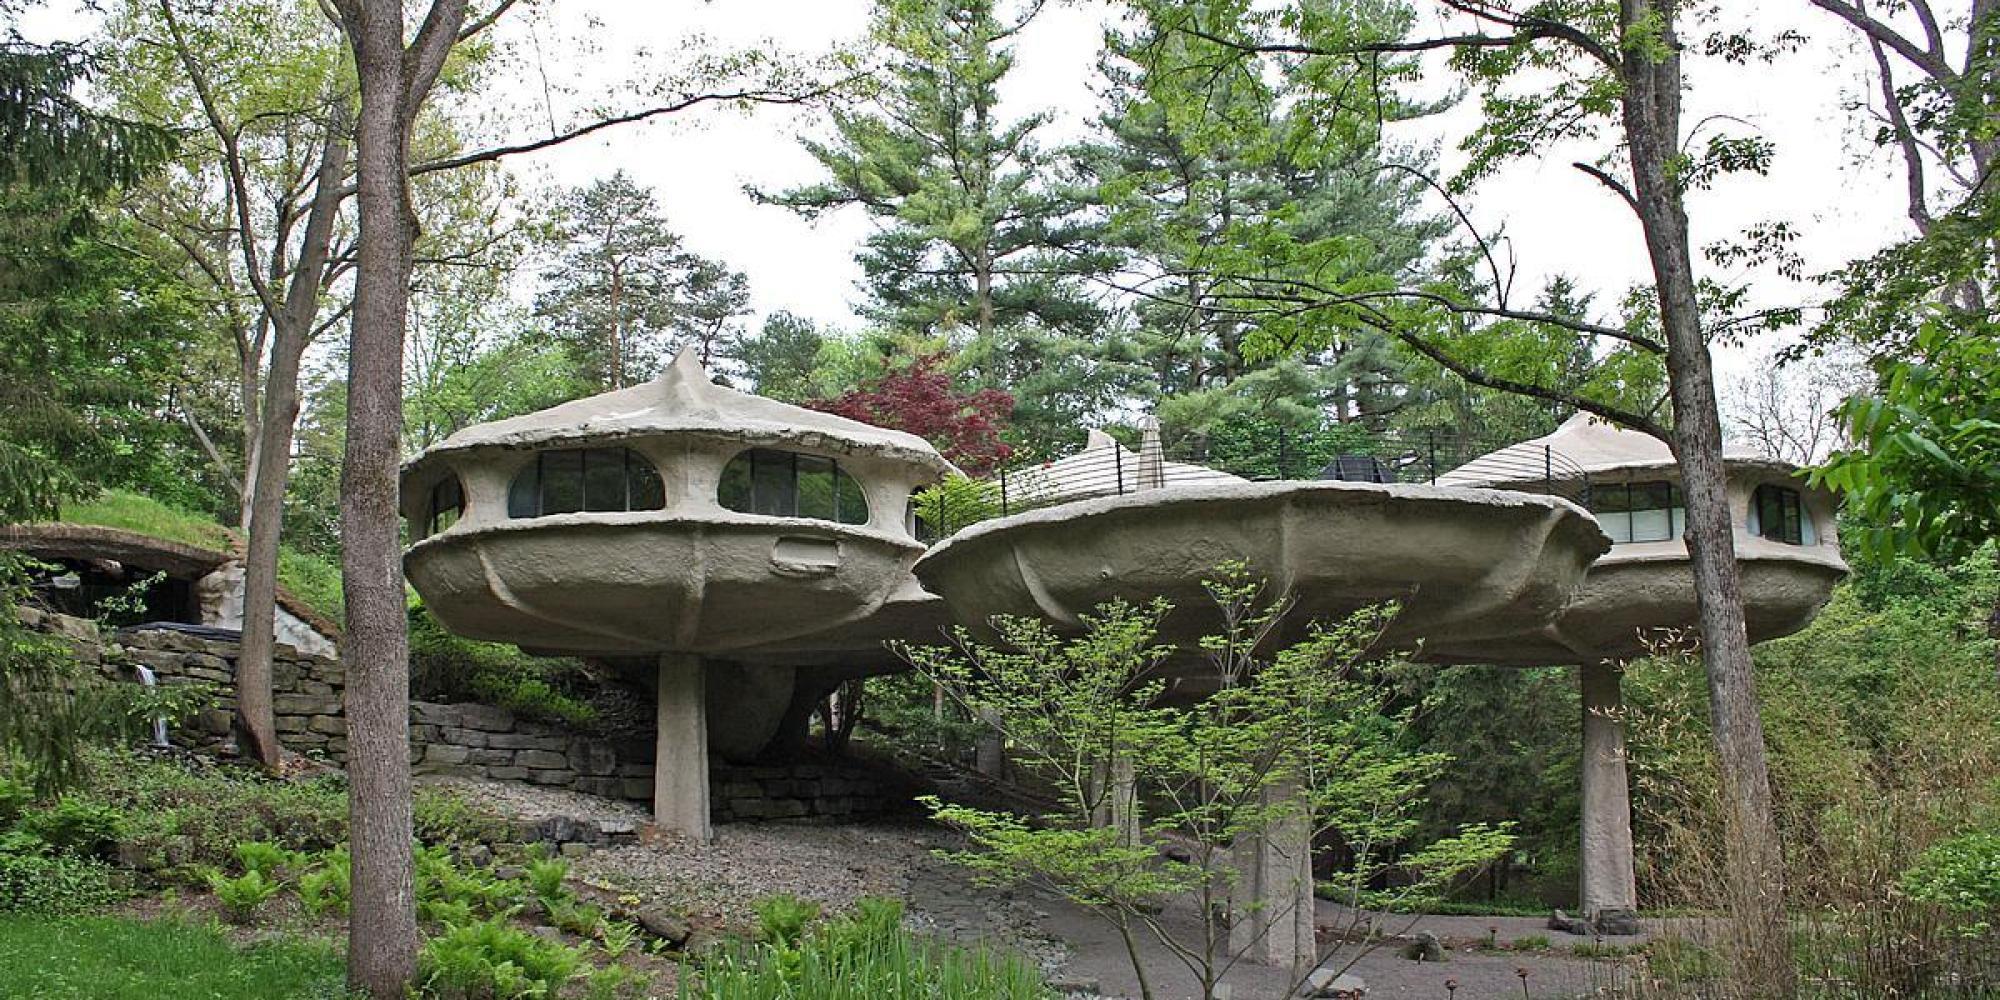 U0027The Mushroom Houseu0027 Is Unlike Any Home Youu0027ve Seen (PHOTOS)   HuffPost